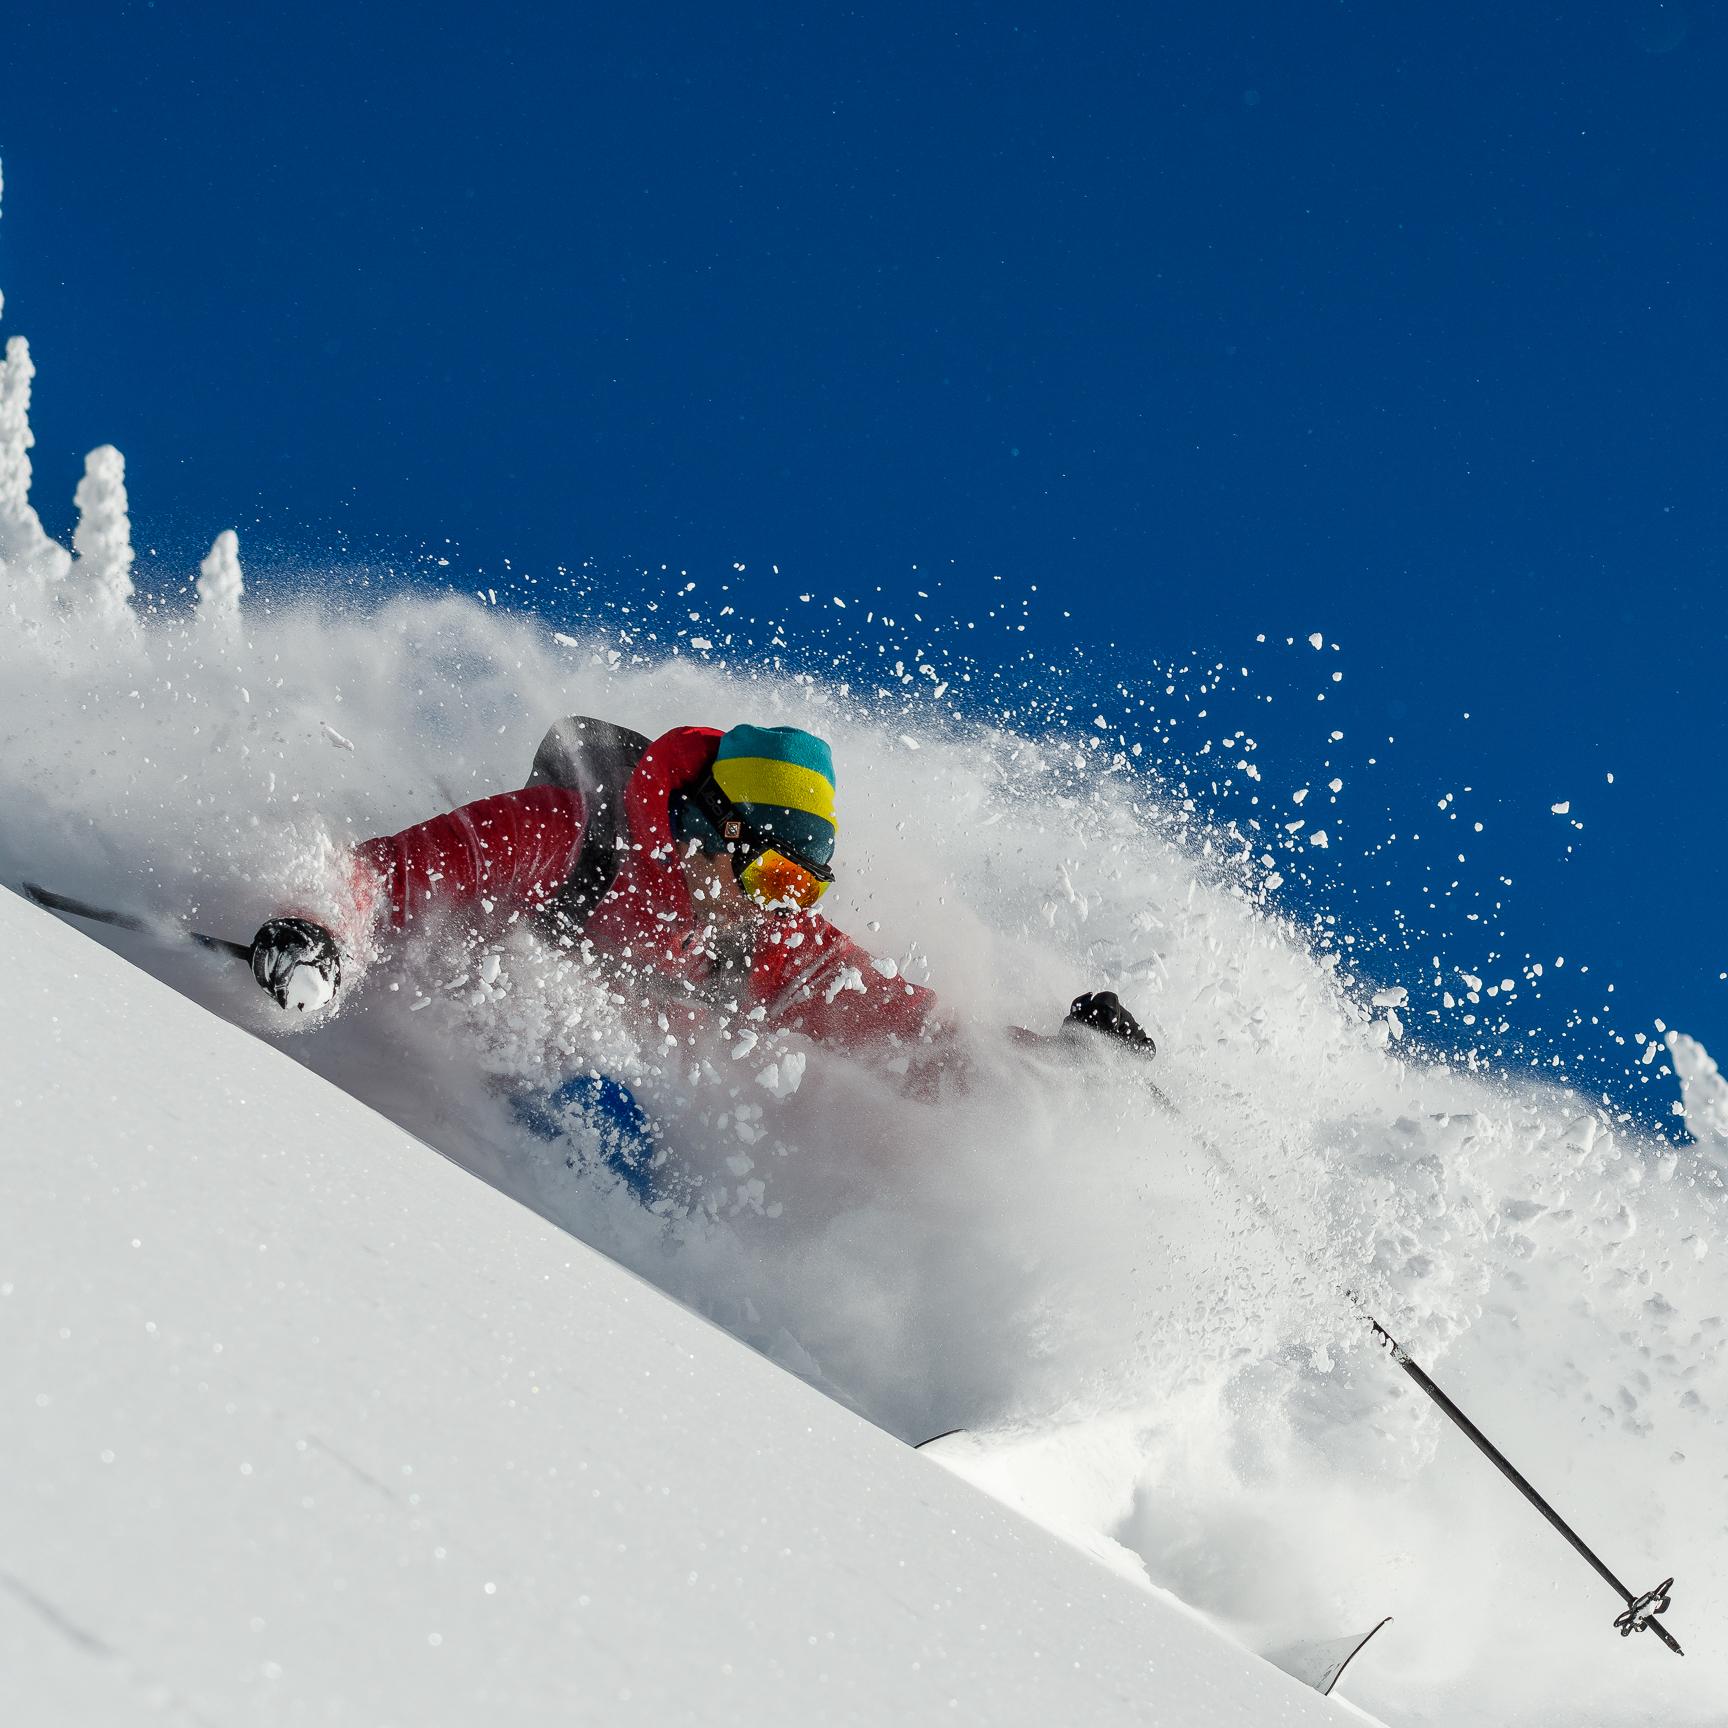 skiing ski guide mountains powder